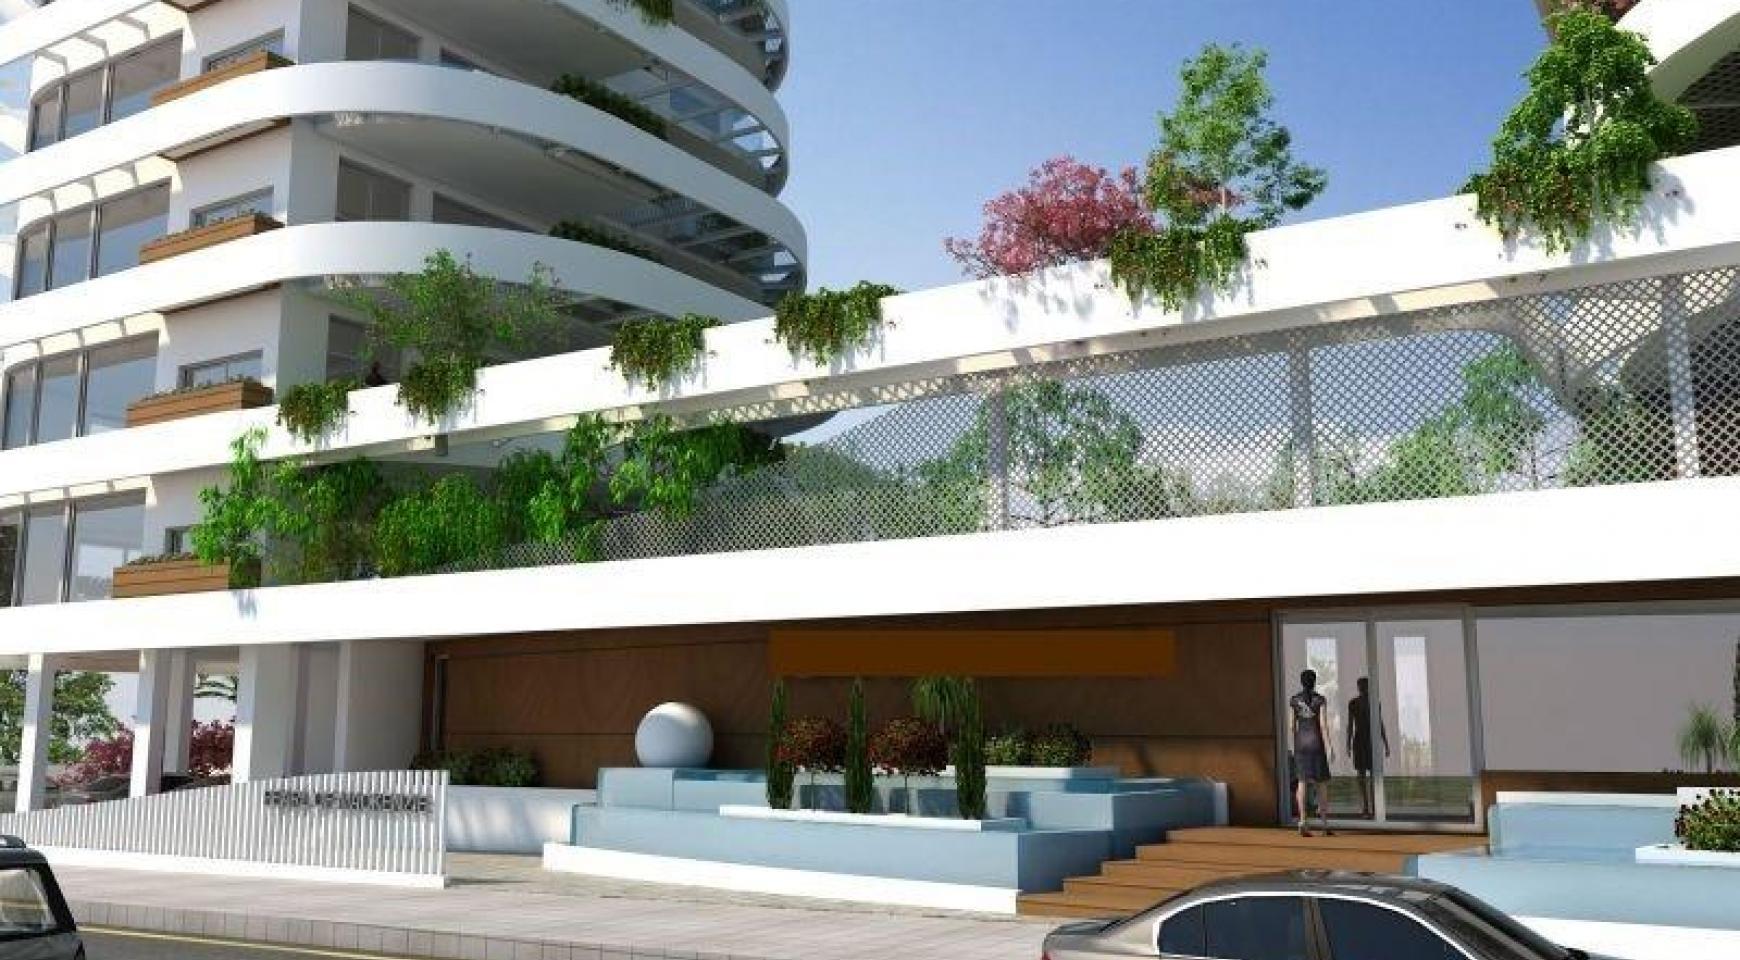 New 2 Bedroom Apartment with Garden - 5